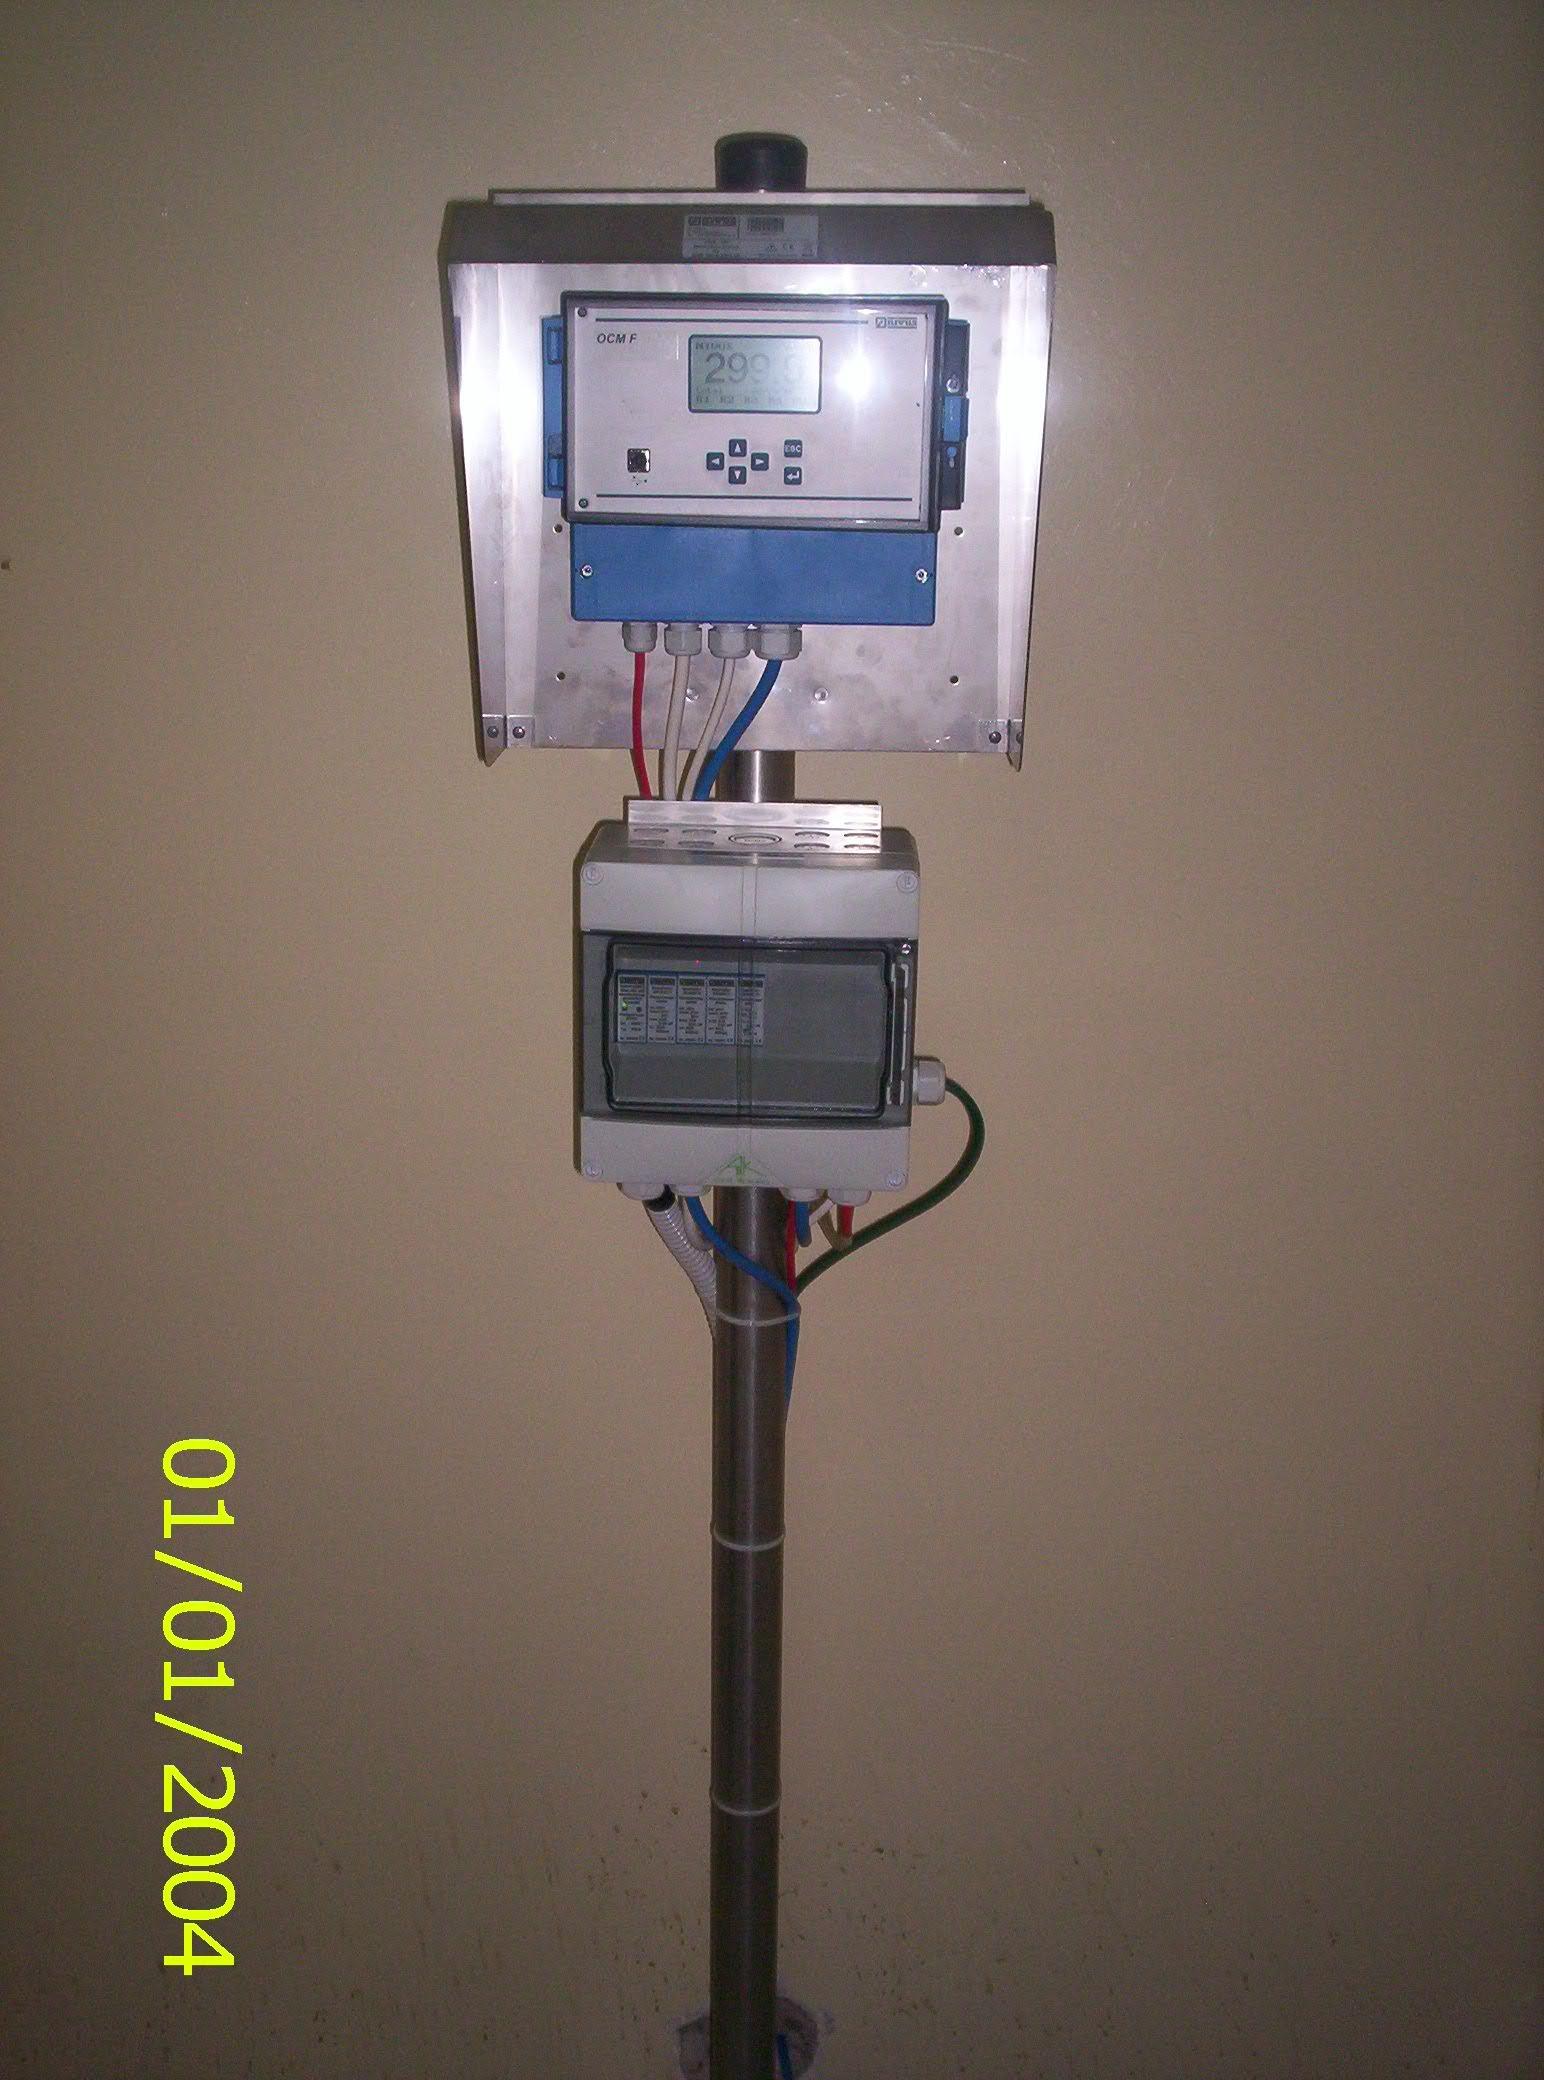 Контролер модел- OCM F